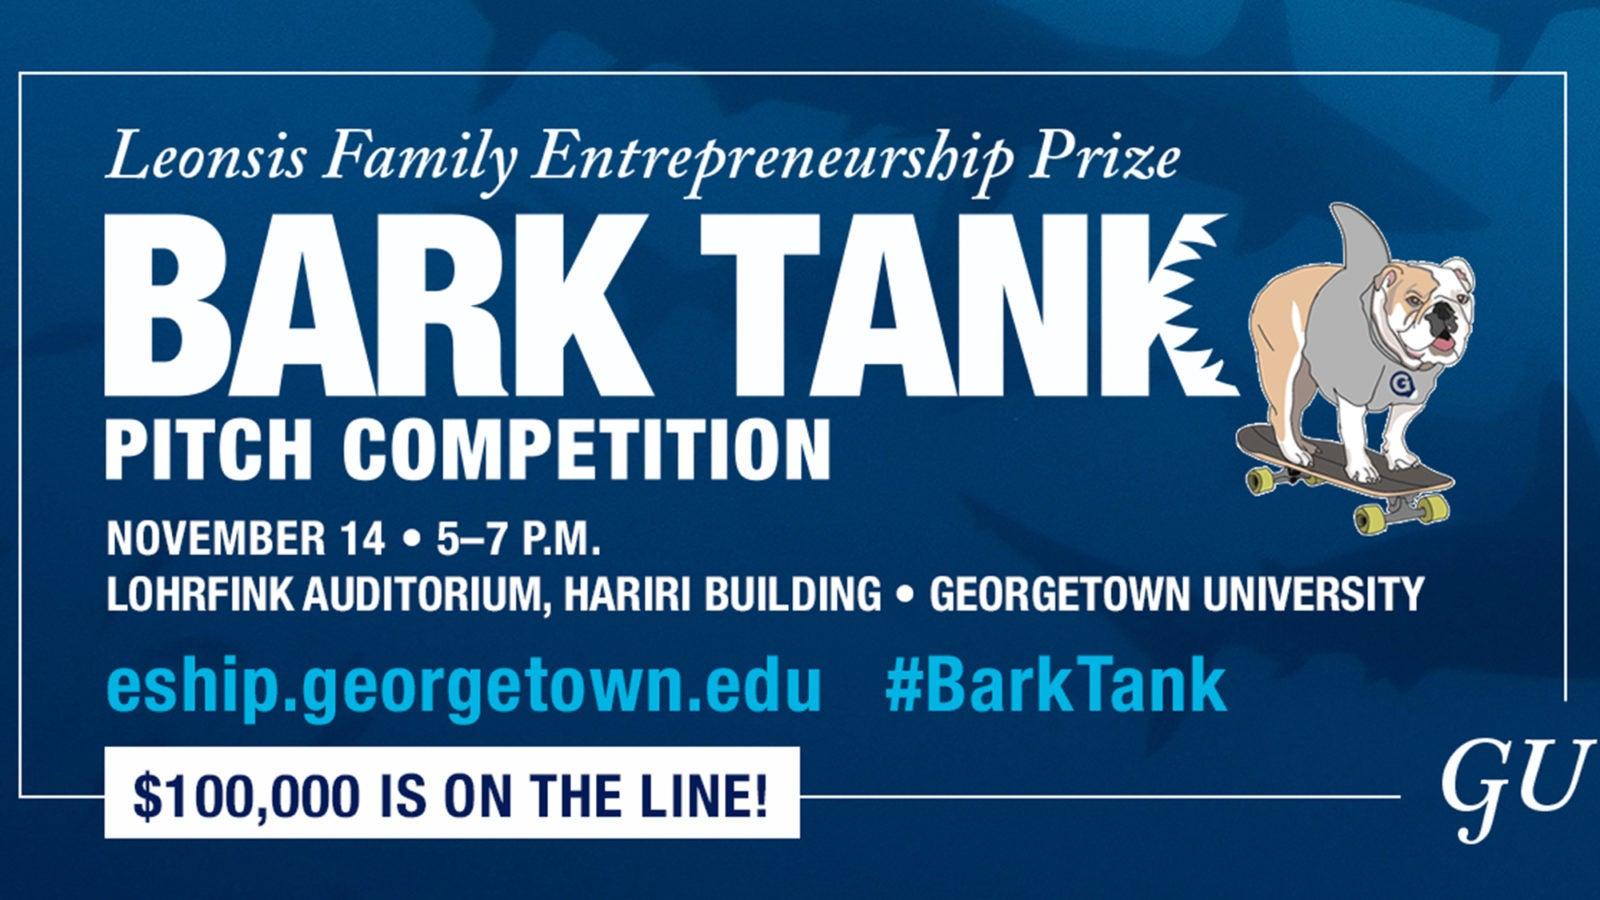 Illustration of Jack the Bulldog on a skateboard with the words Georgetown Entrepreneurship Prize Bark Tank Competition. November 14. 5-7 p.m., Lohrfink Auditorium, Hariri Building, Georgetown University, eship.georgetown, Georgetown University, #BarTank, $100,000 is on the line!